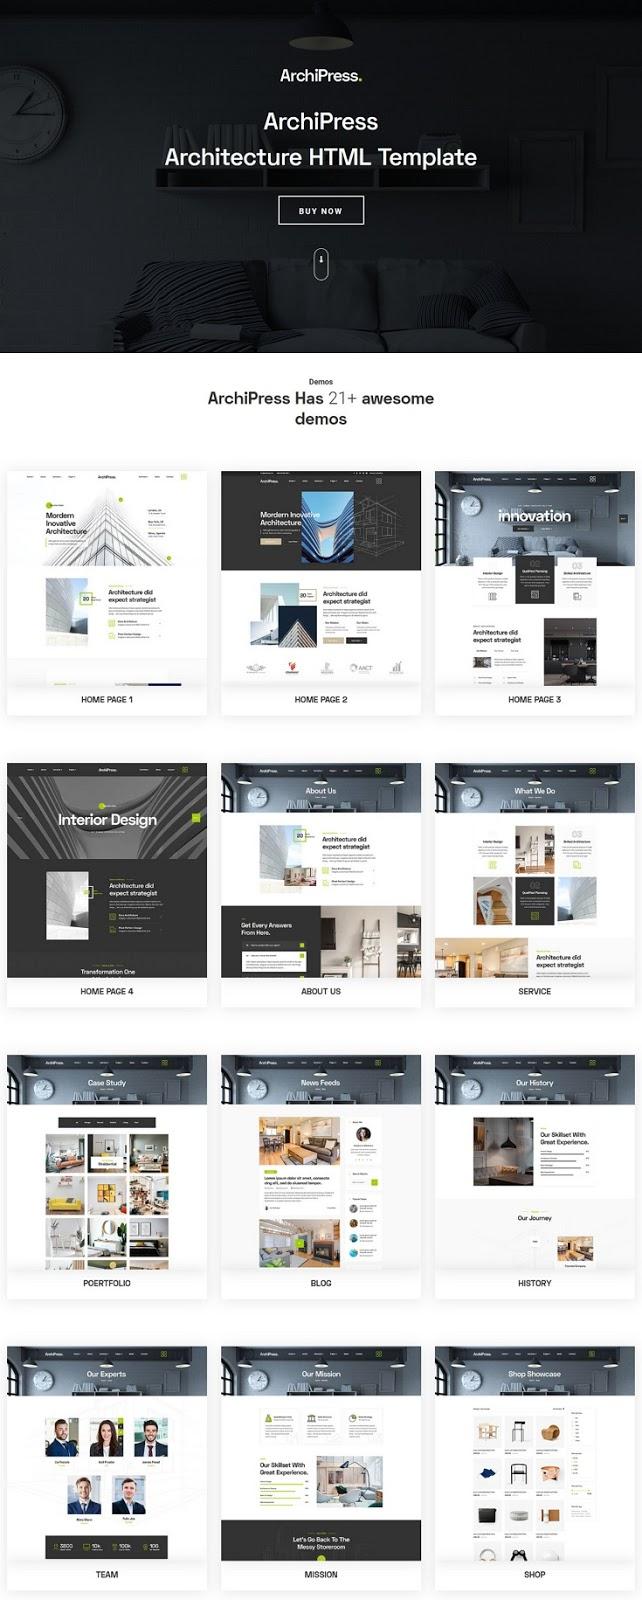 Best Architecture, Agency & Interior Design HTML Template